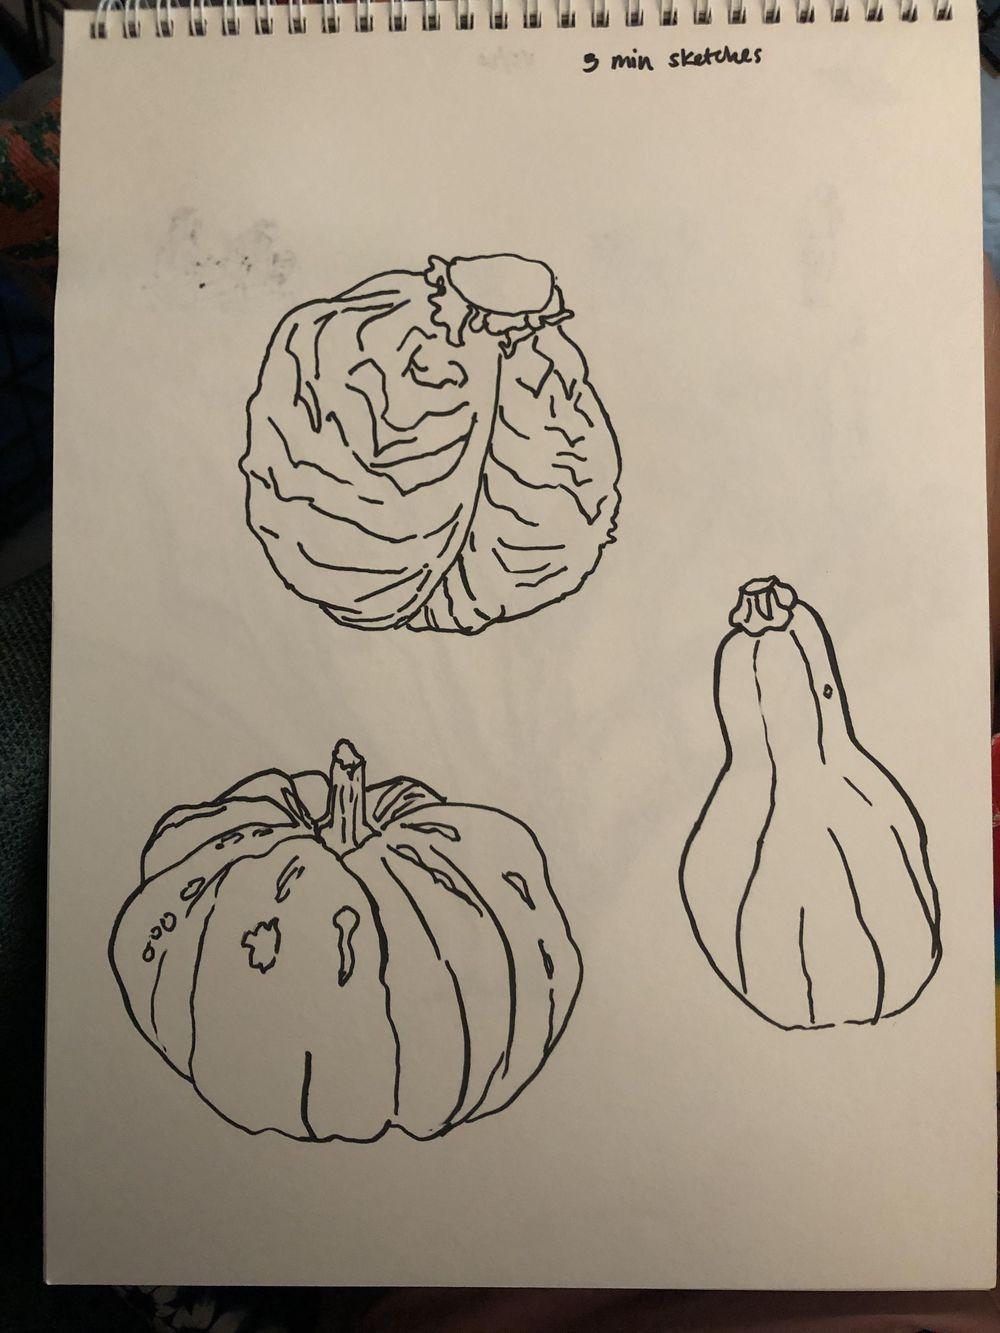 Veggies - image 1 - student project